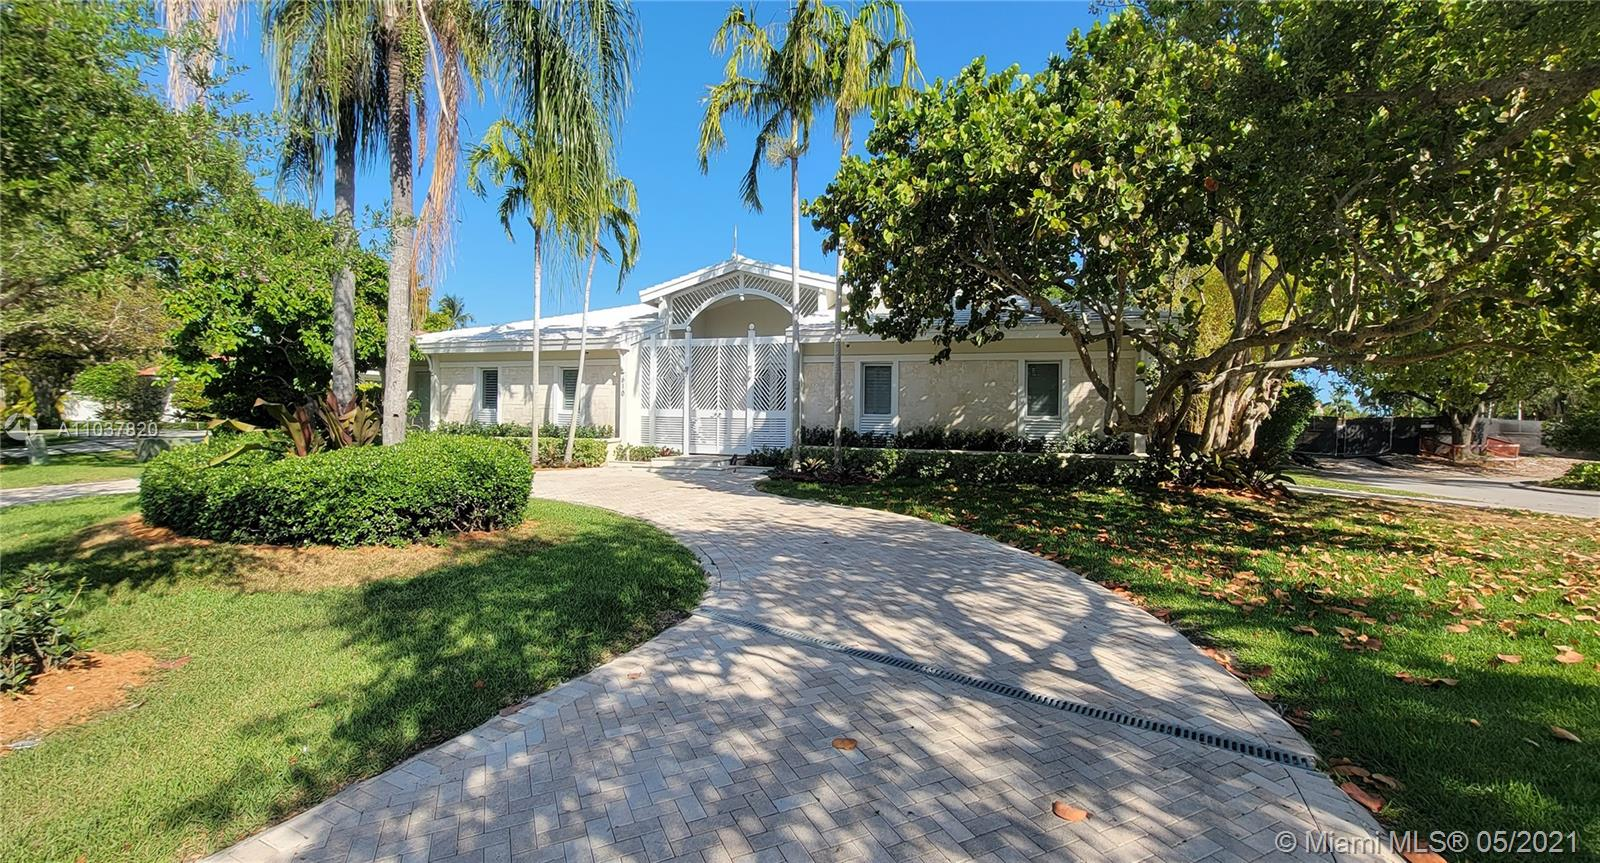 Old Cutler Bay - 610 Reinante Ave, Coral Gables, FL 33156